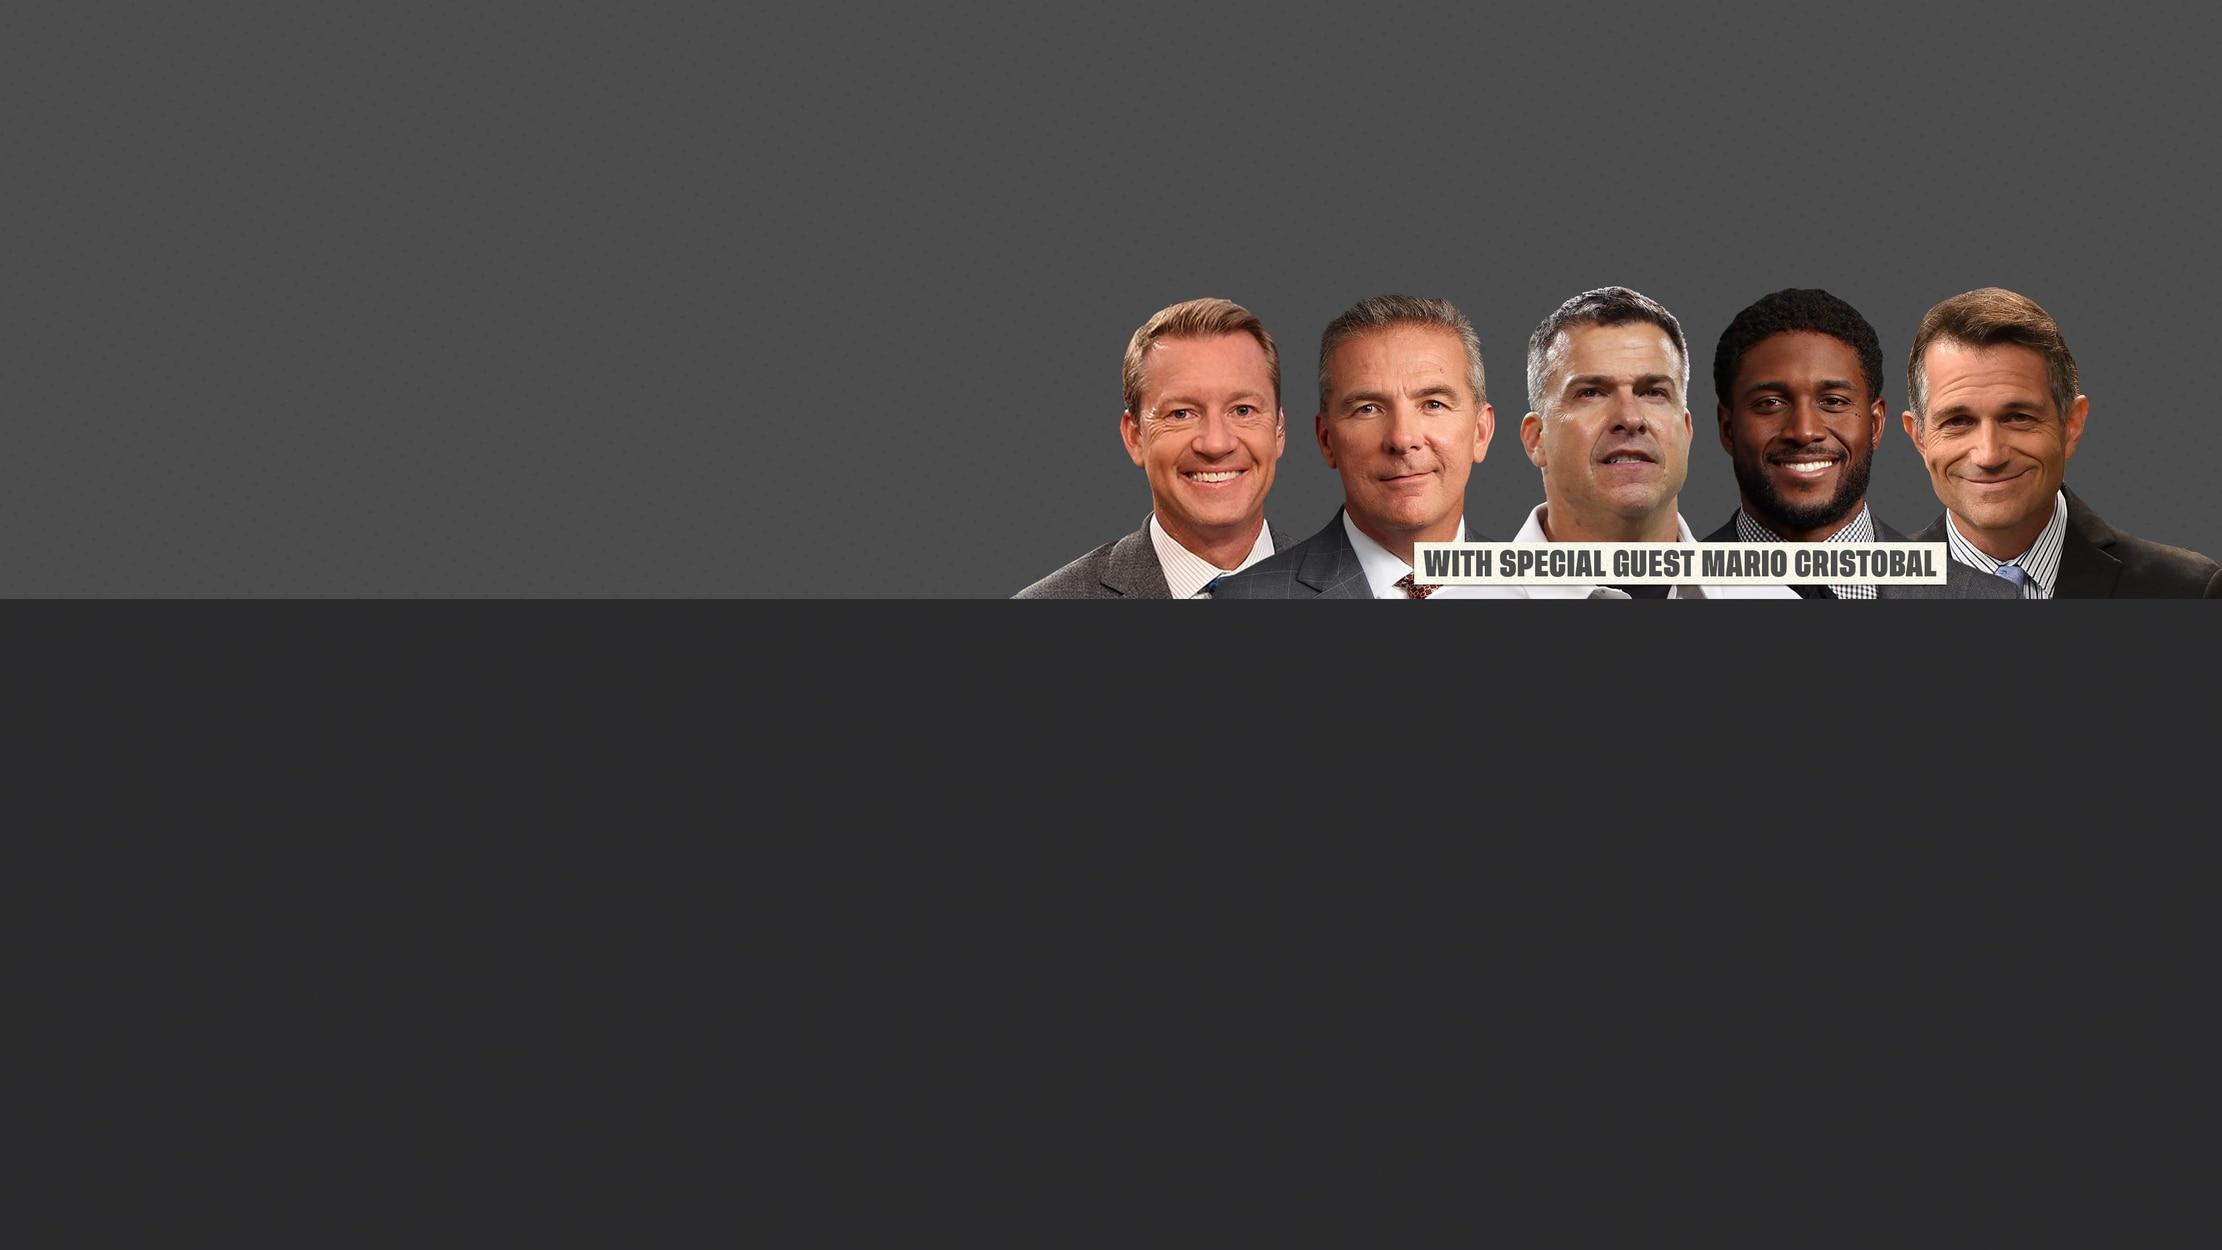 Big Noon Kickoff: The Offseason - Top 5 Breakout Teams